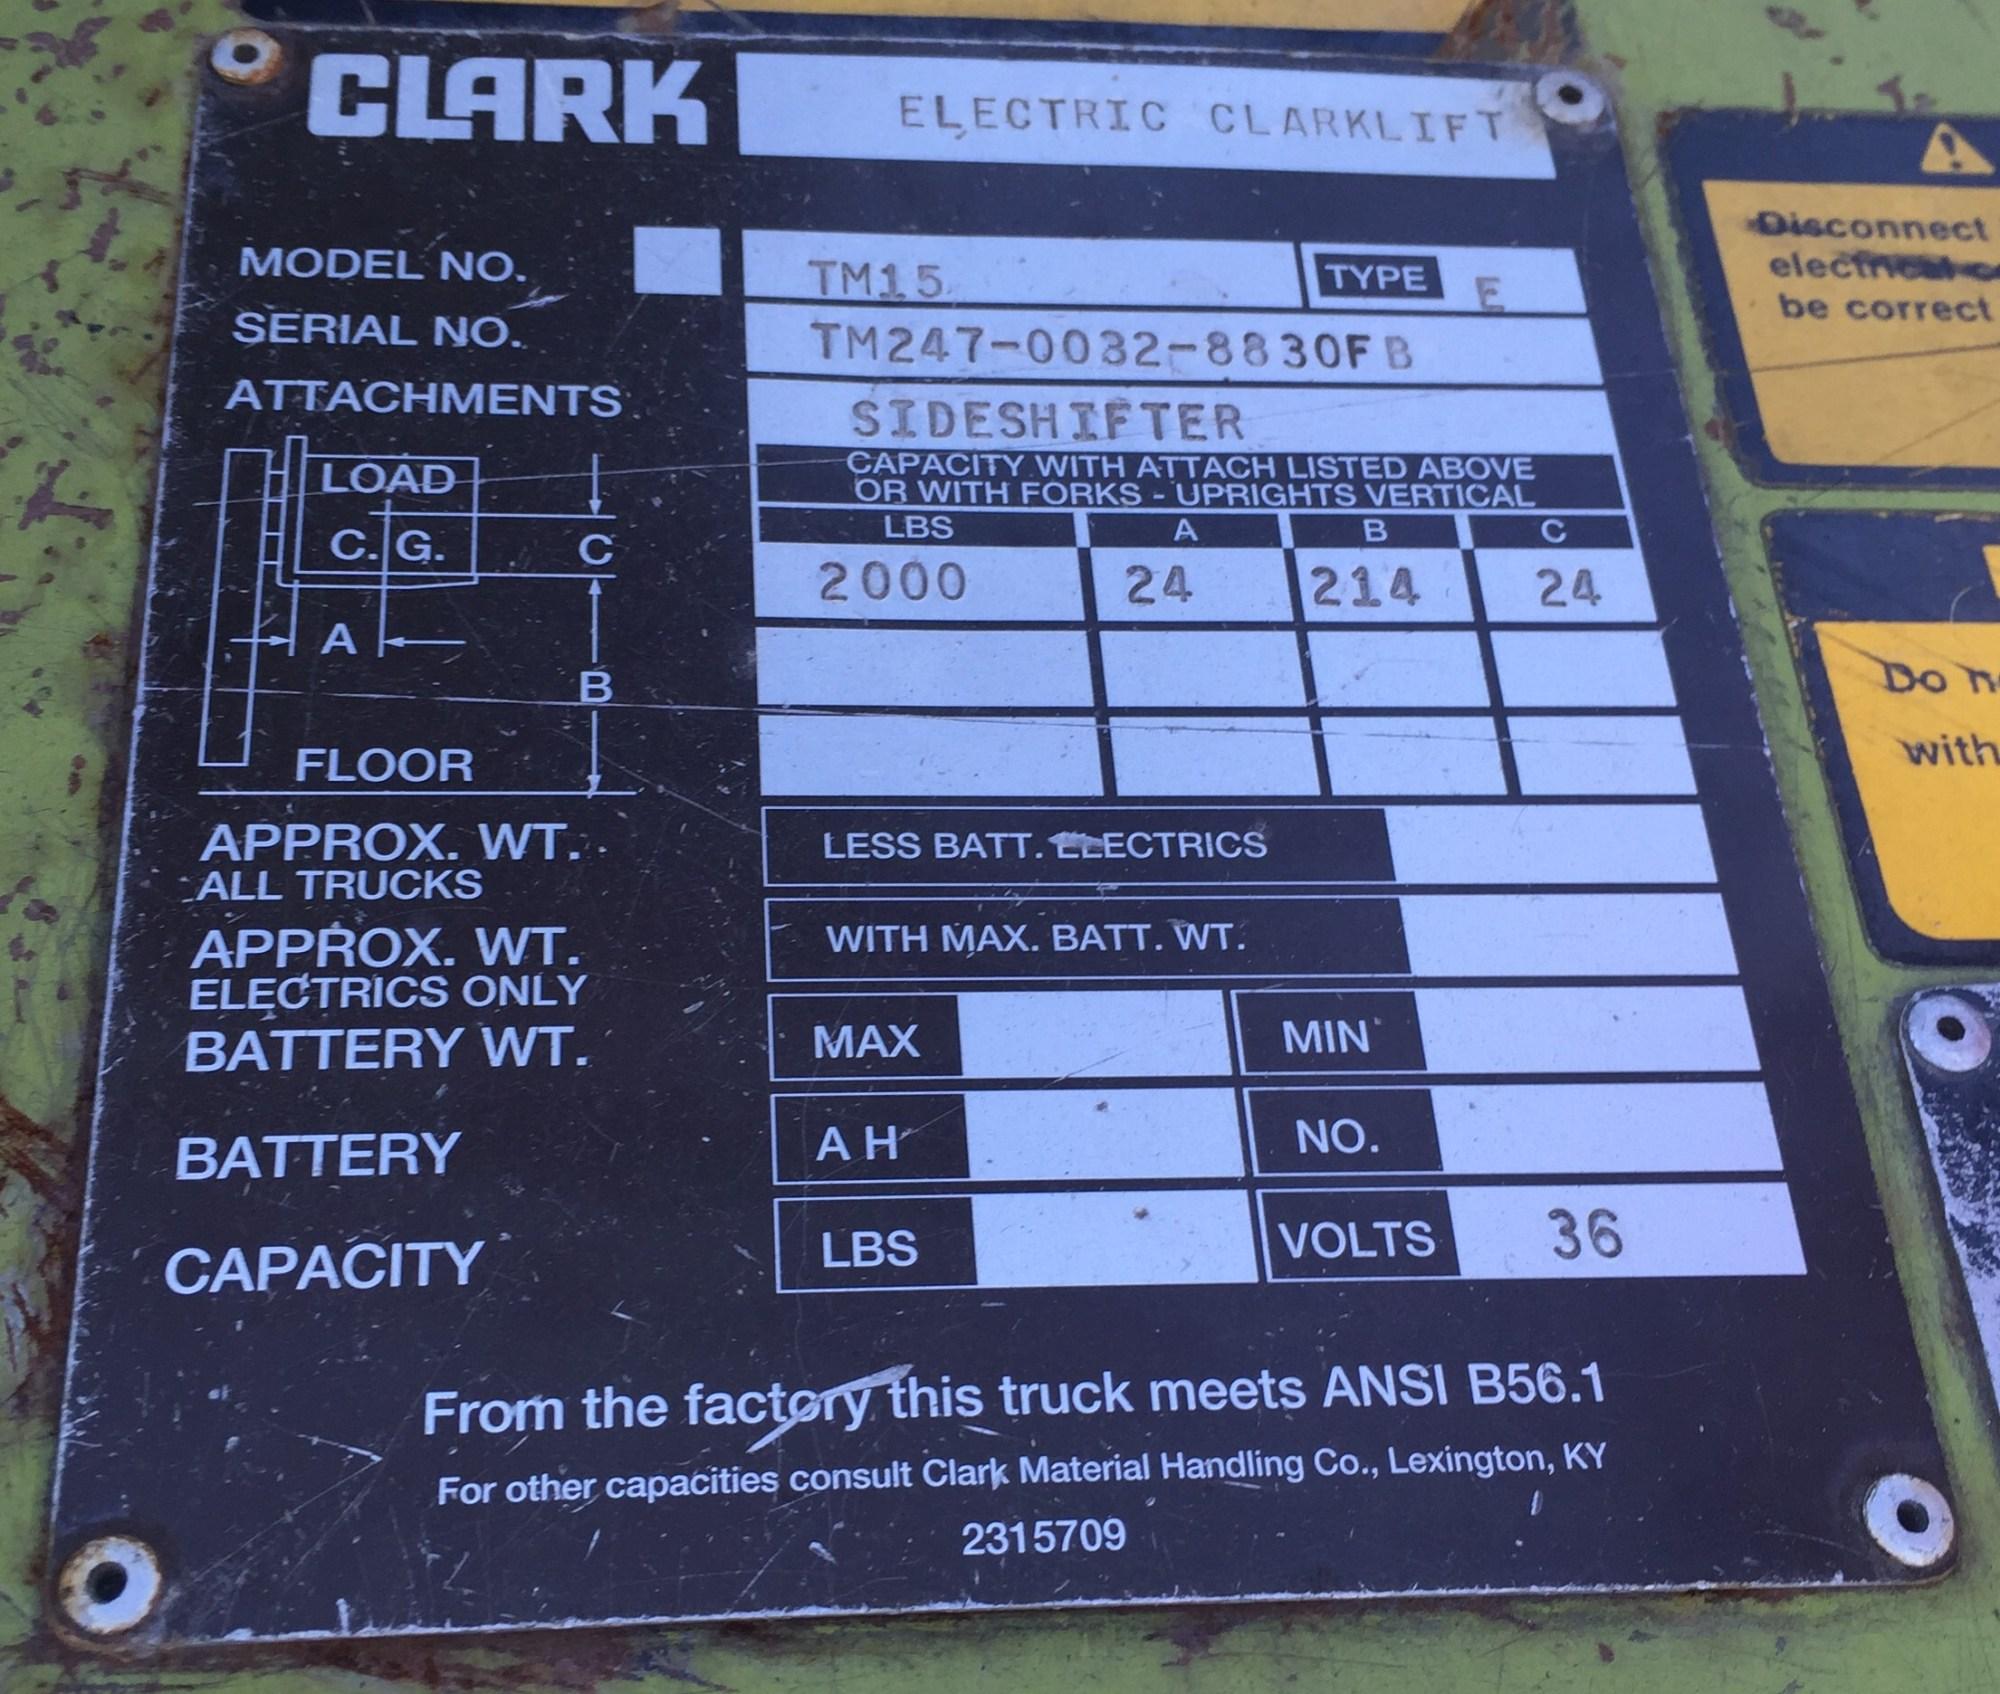 hight resolution of clark forklift s serial number clark forklift s serial number